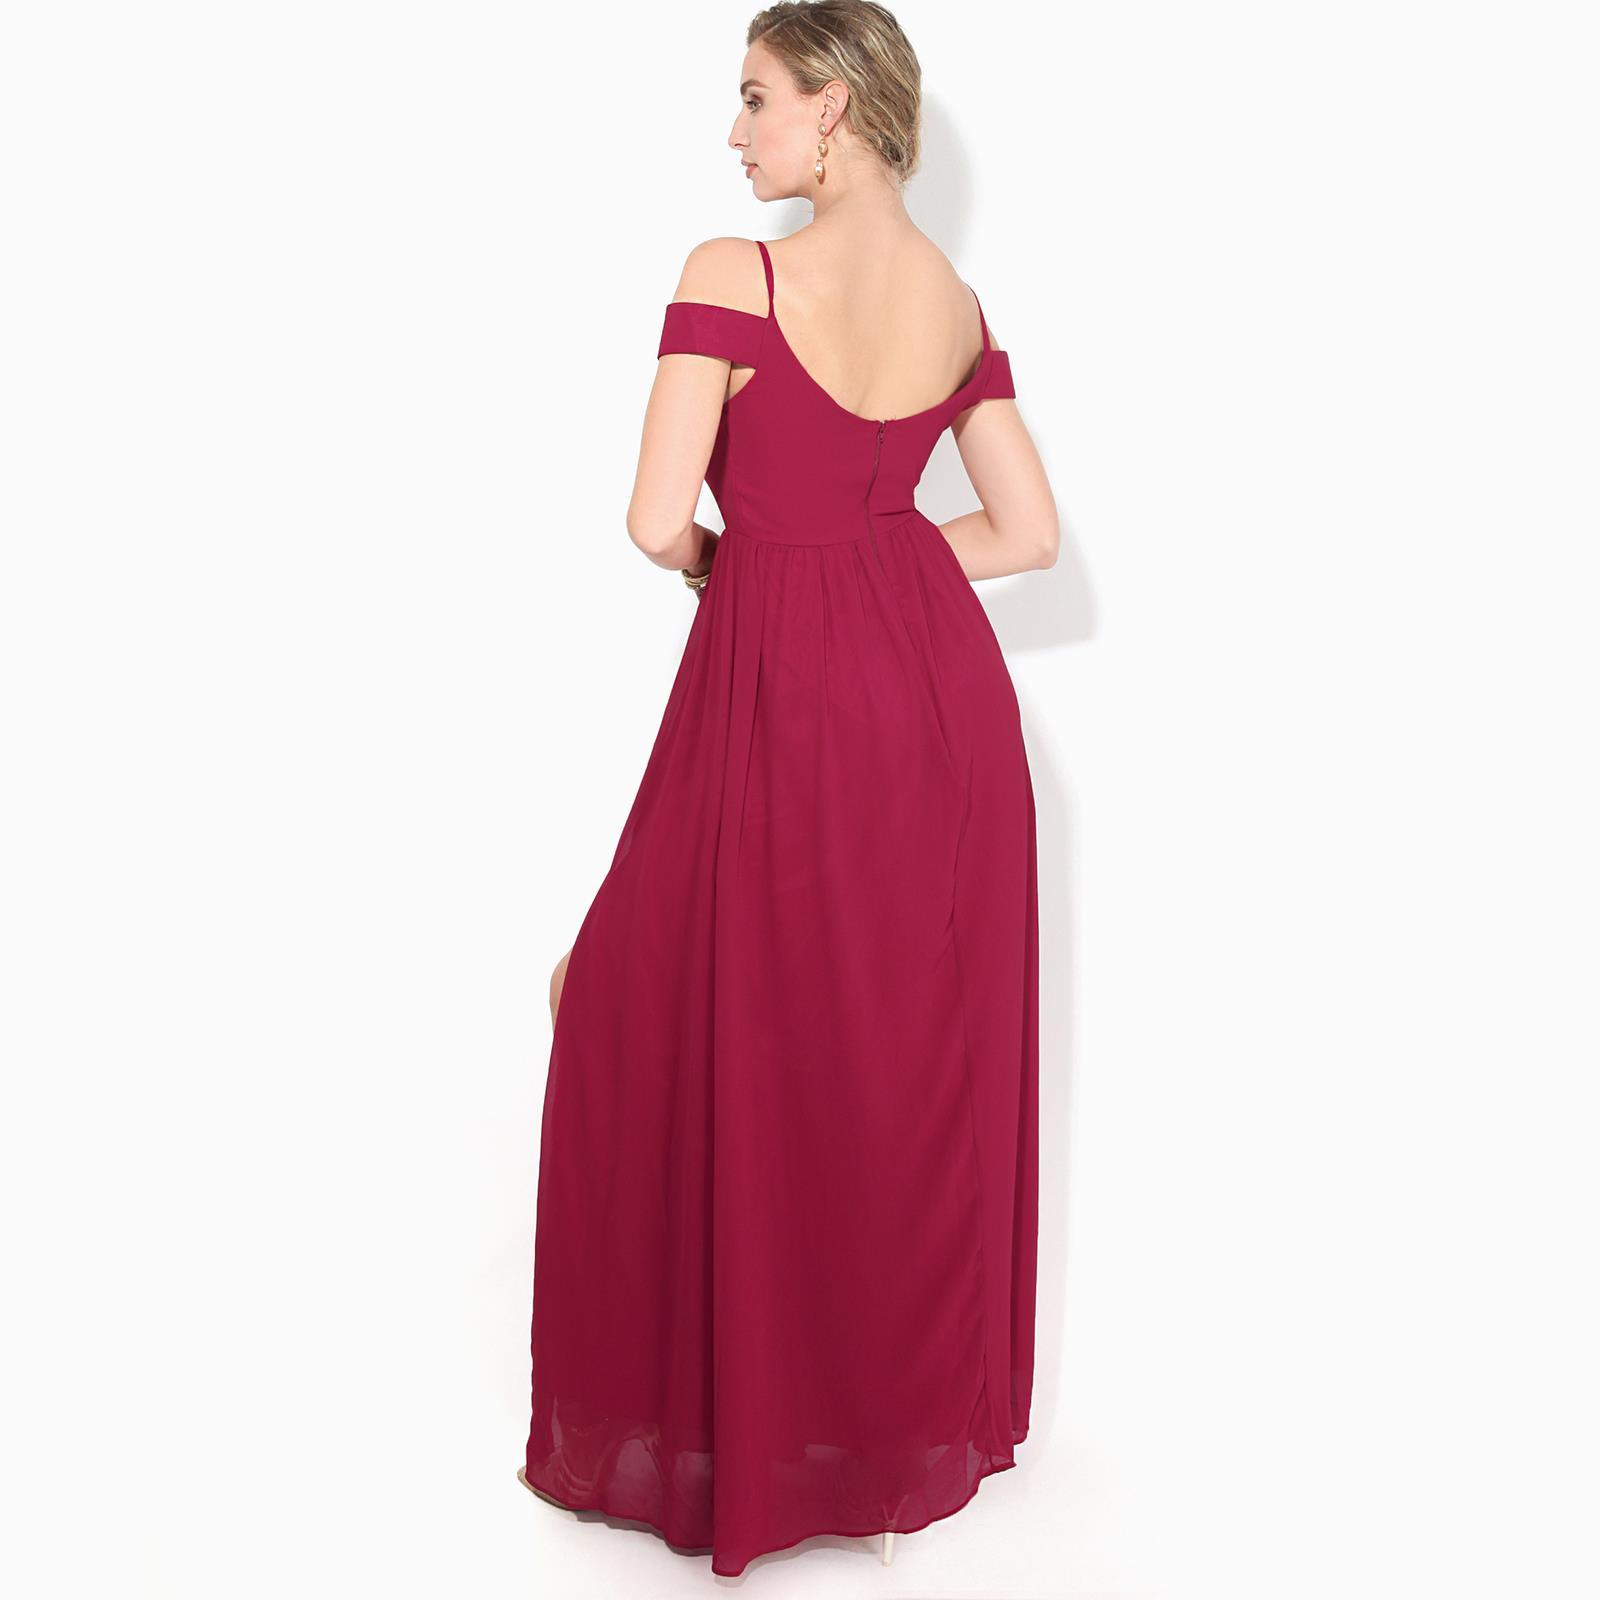 Womens-Ladies-Off-Shoulder-Formal-Maxi-Dress-Slit-Split-Long-Gown-Wedding-Party thumbnail 7